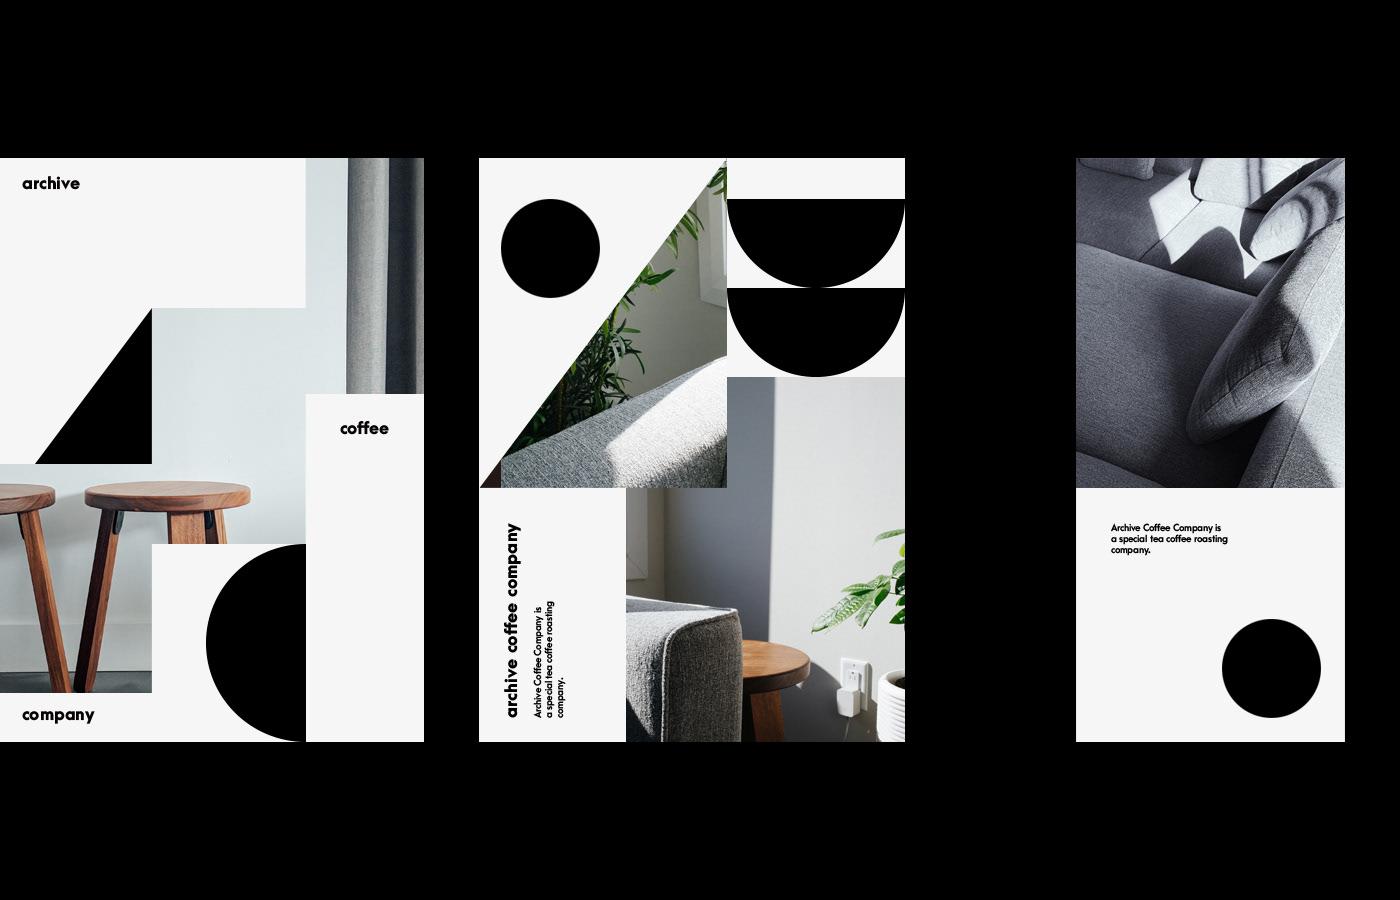 branding  BX design cafe Coffee identity Logotype minimal Packaging Patterns simple